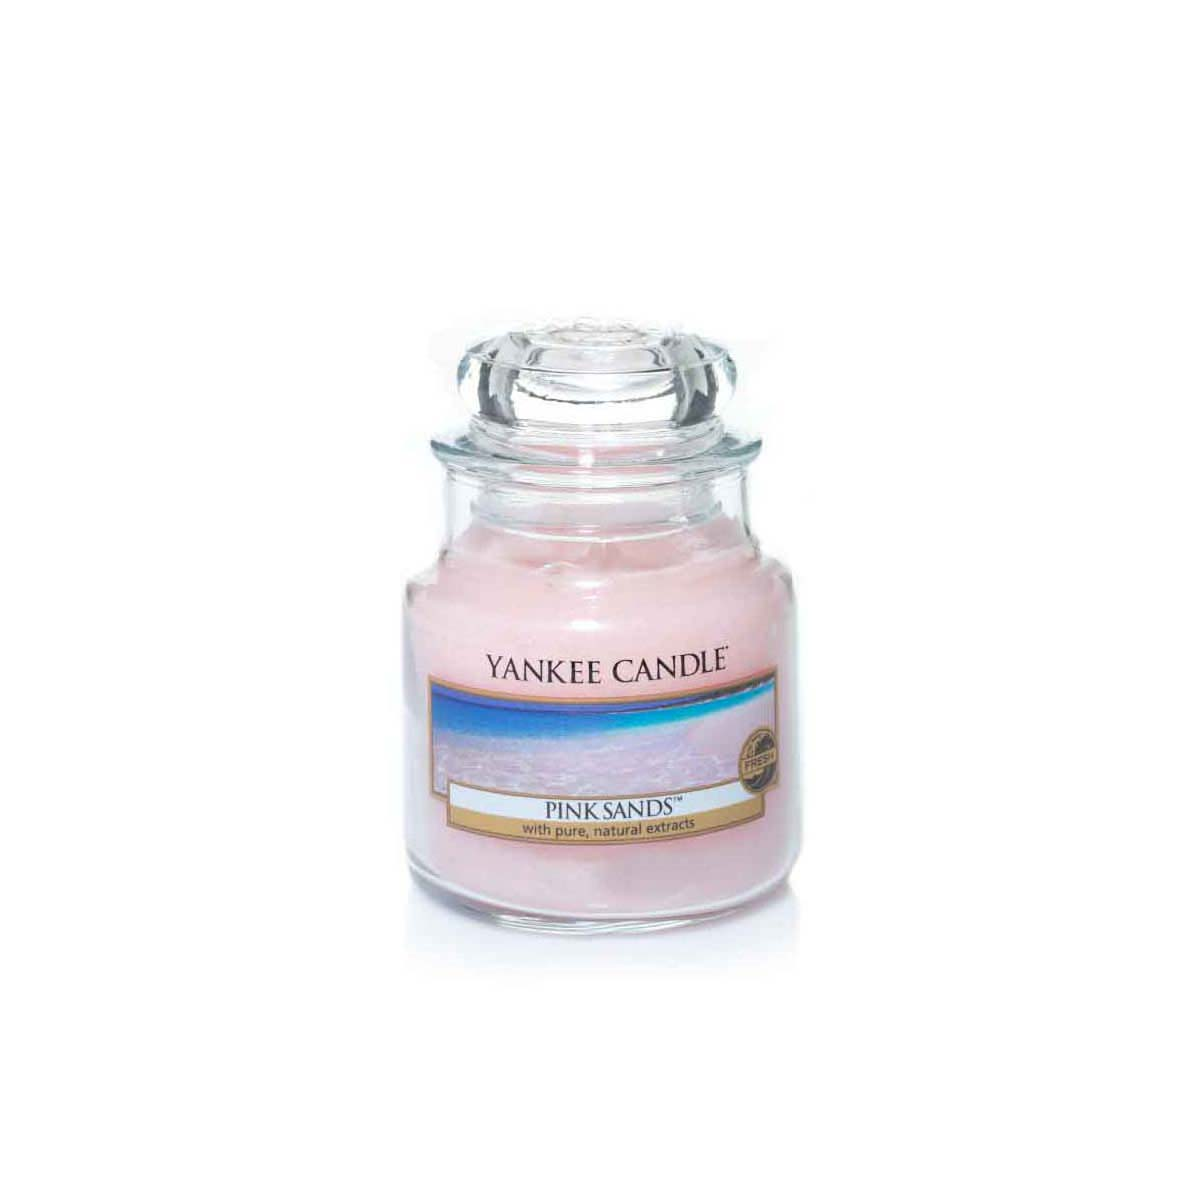 Yankee Candle Pink Sands Giara Piccola